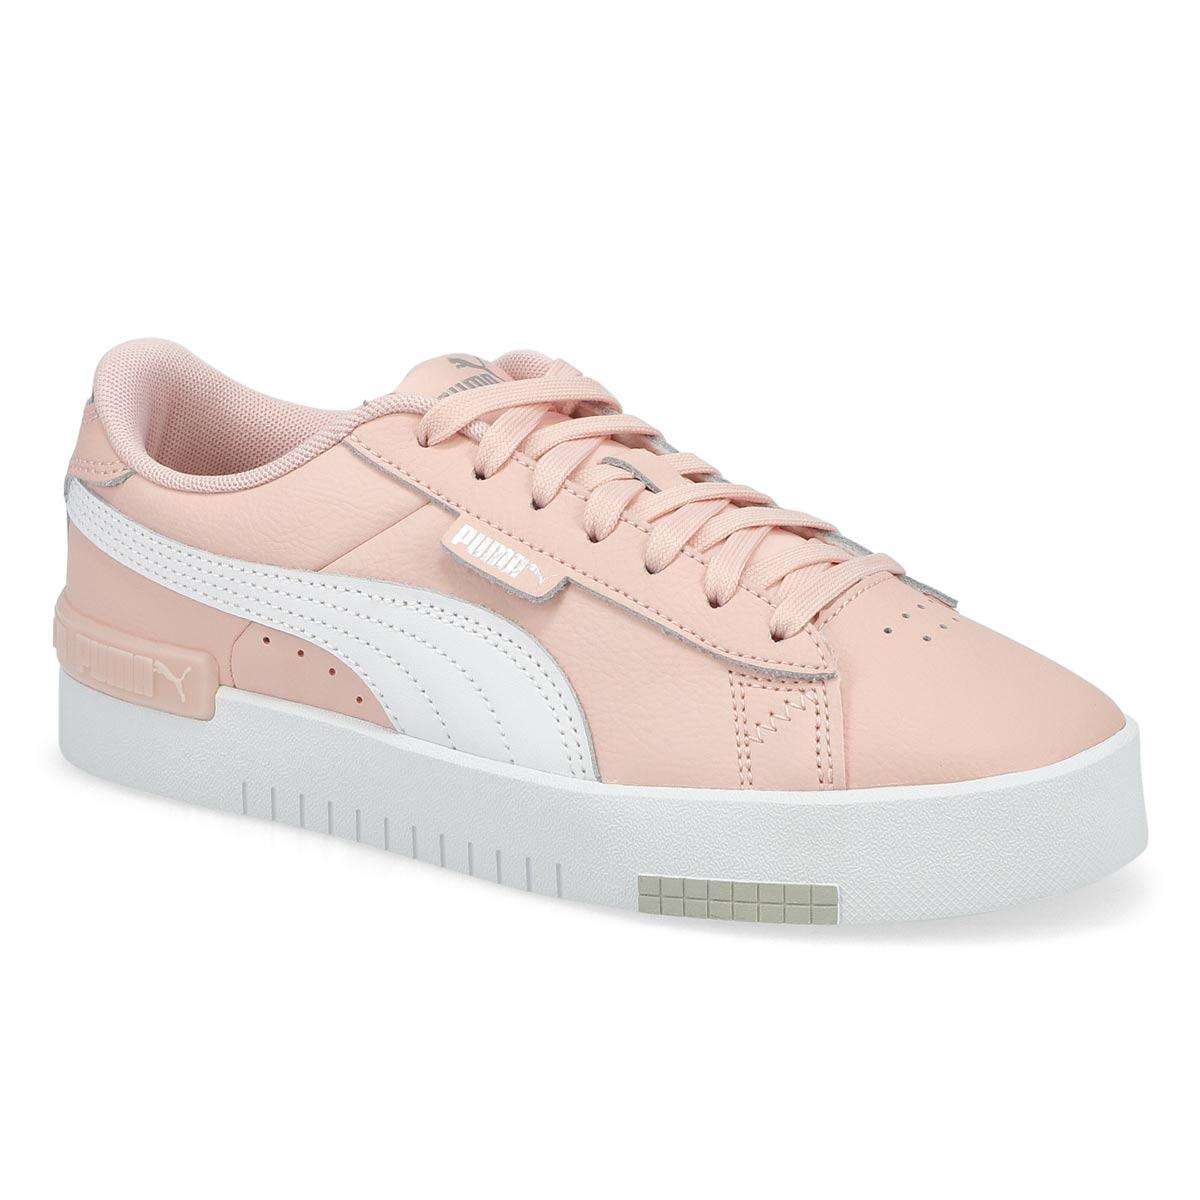 Women's Jada Sneaker - Peyote/White